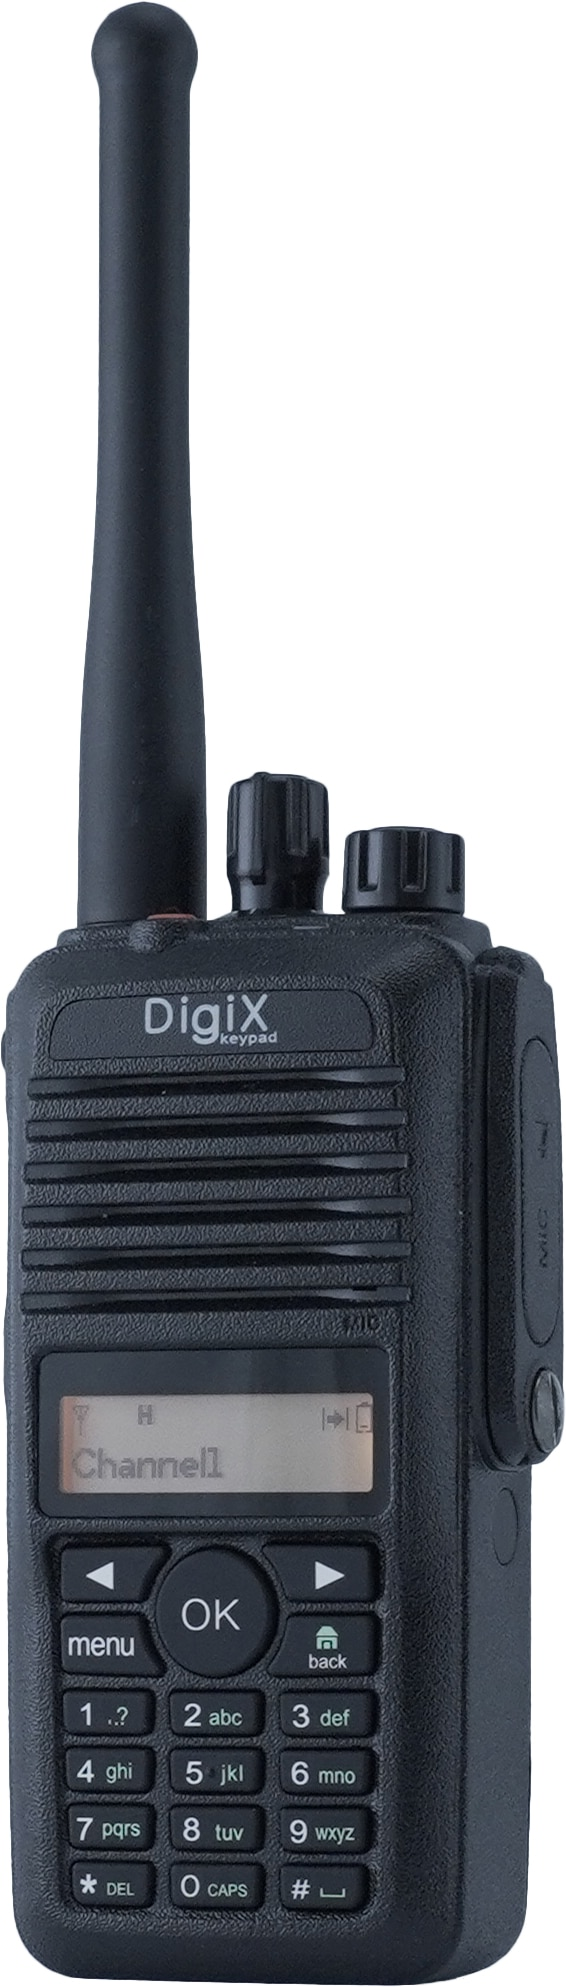 DigiX Keypad DMR